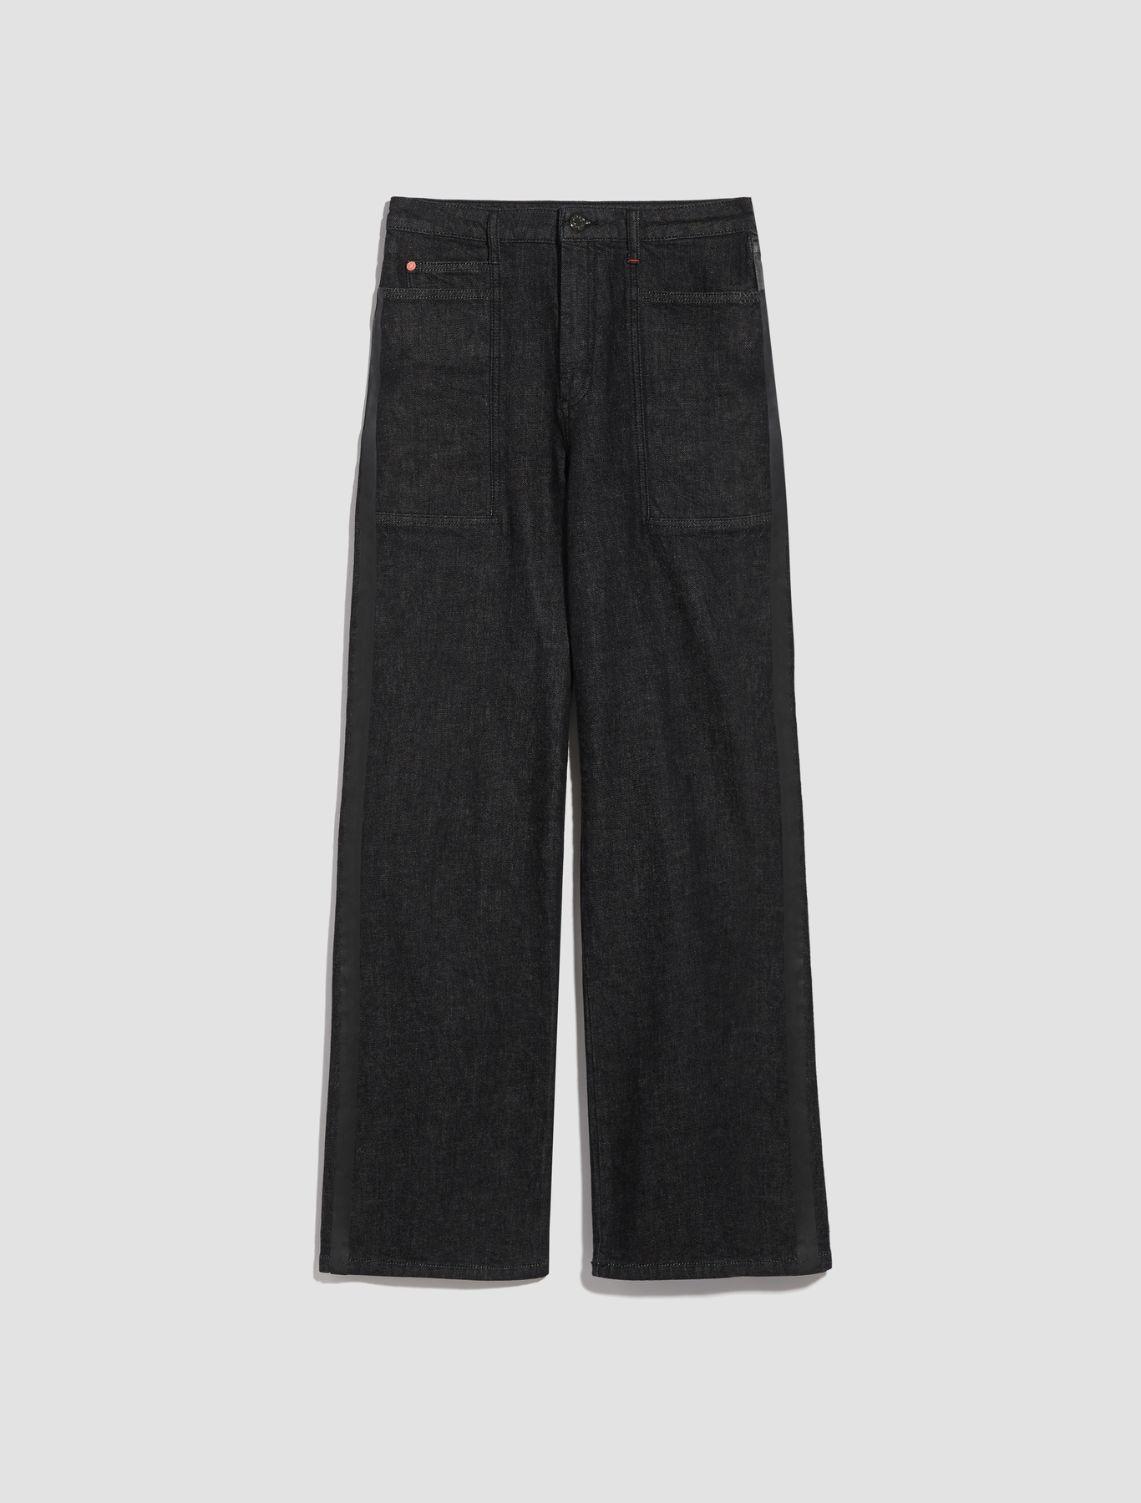 DENTICE Denim trouser 5